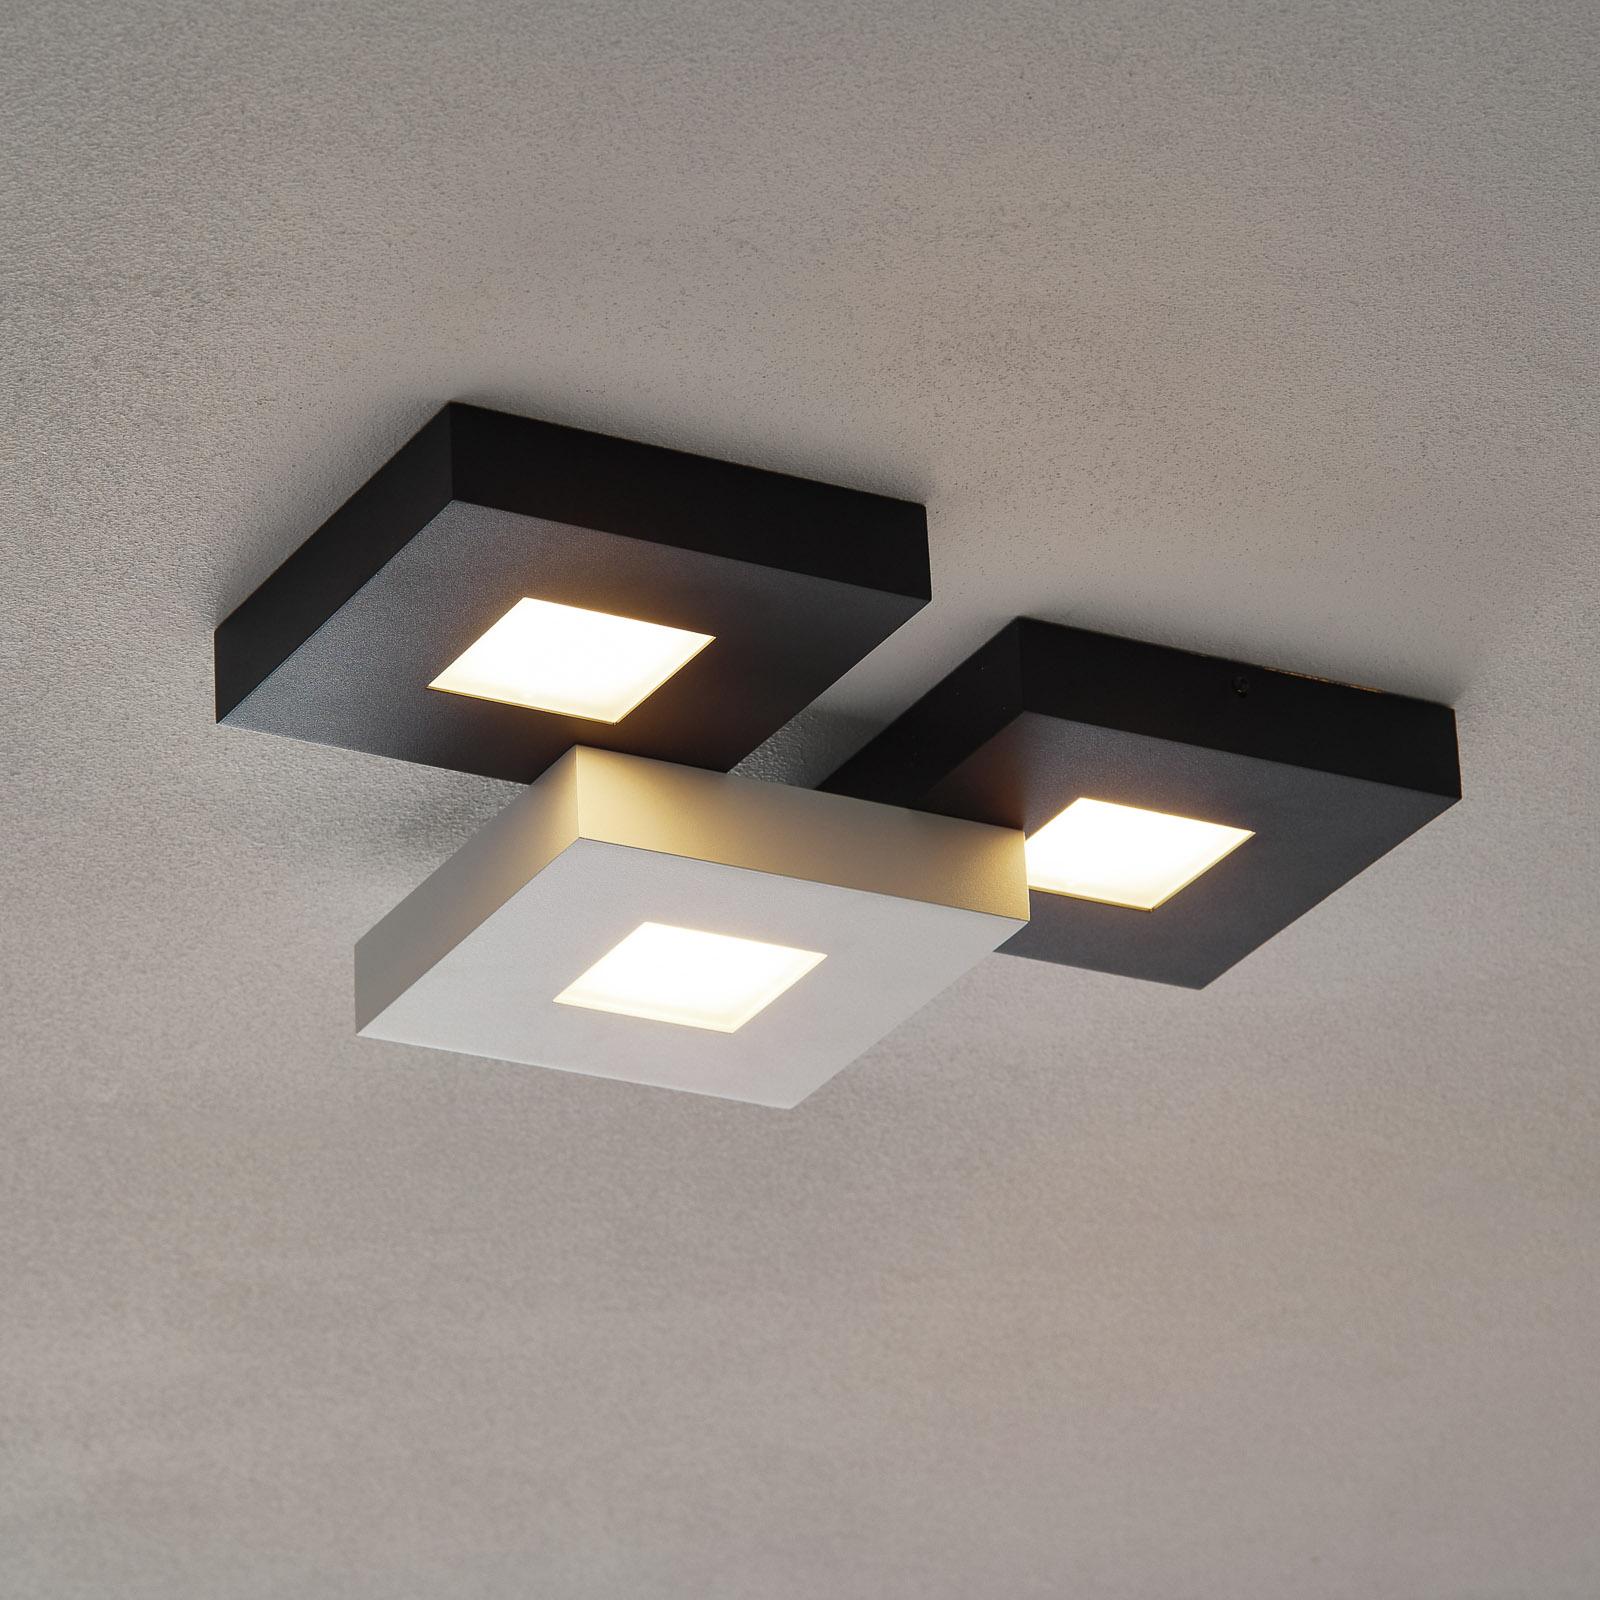 3-punktowa lampa sufitowa LED Cubus, czarno-biała